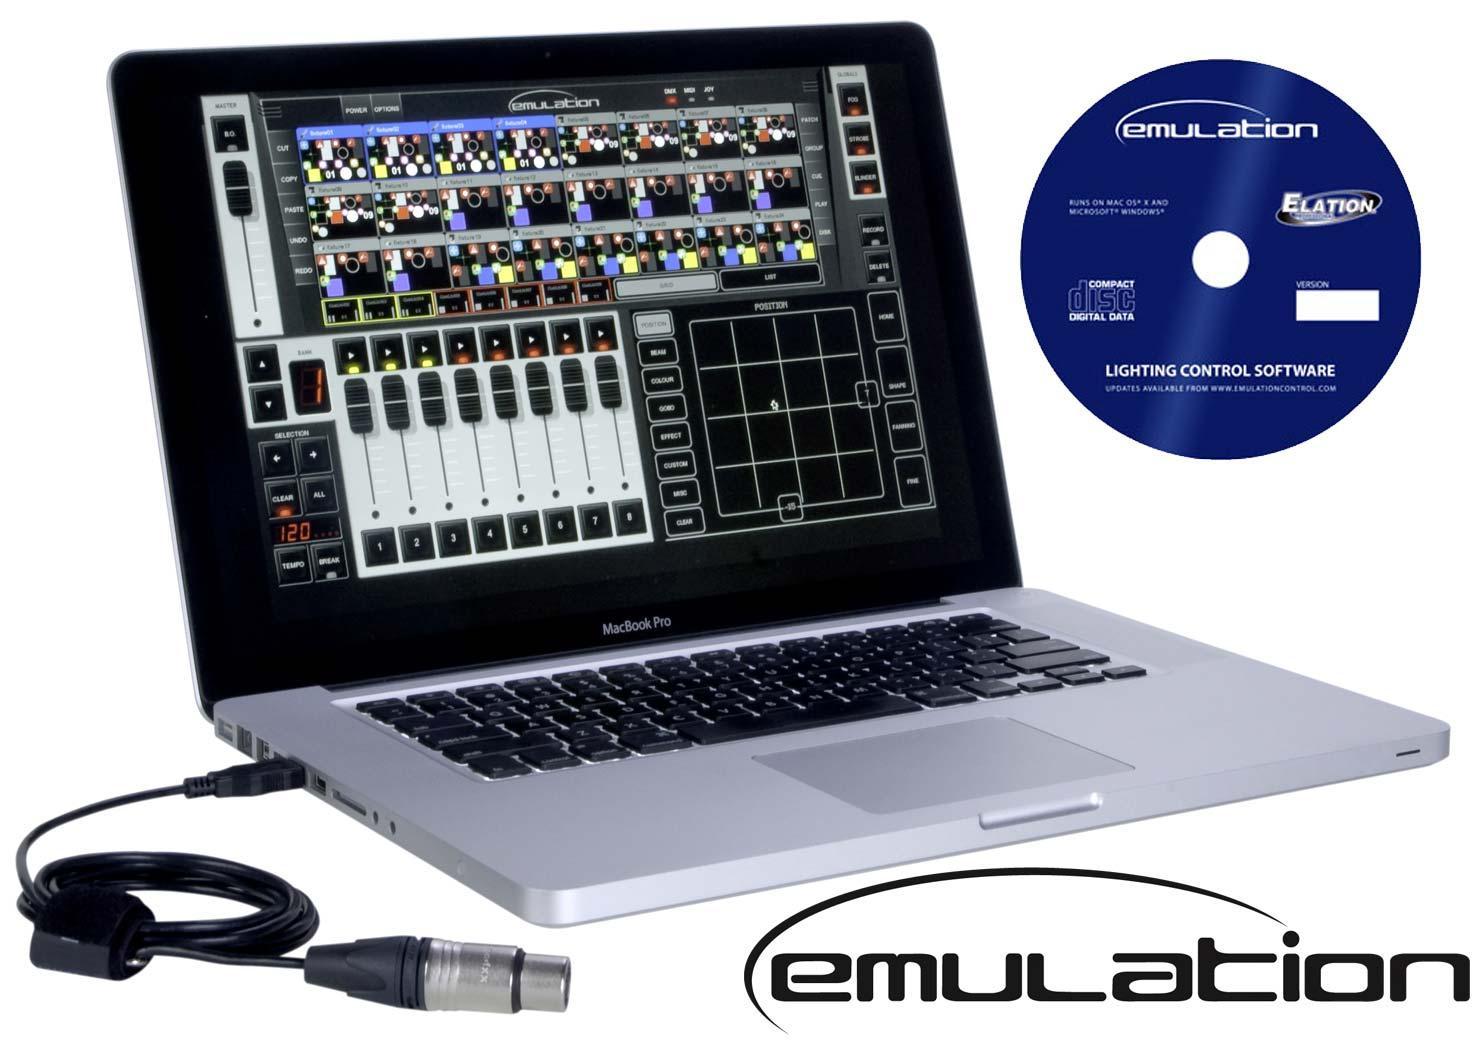 dmx lighting control software for mac